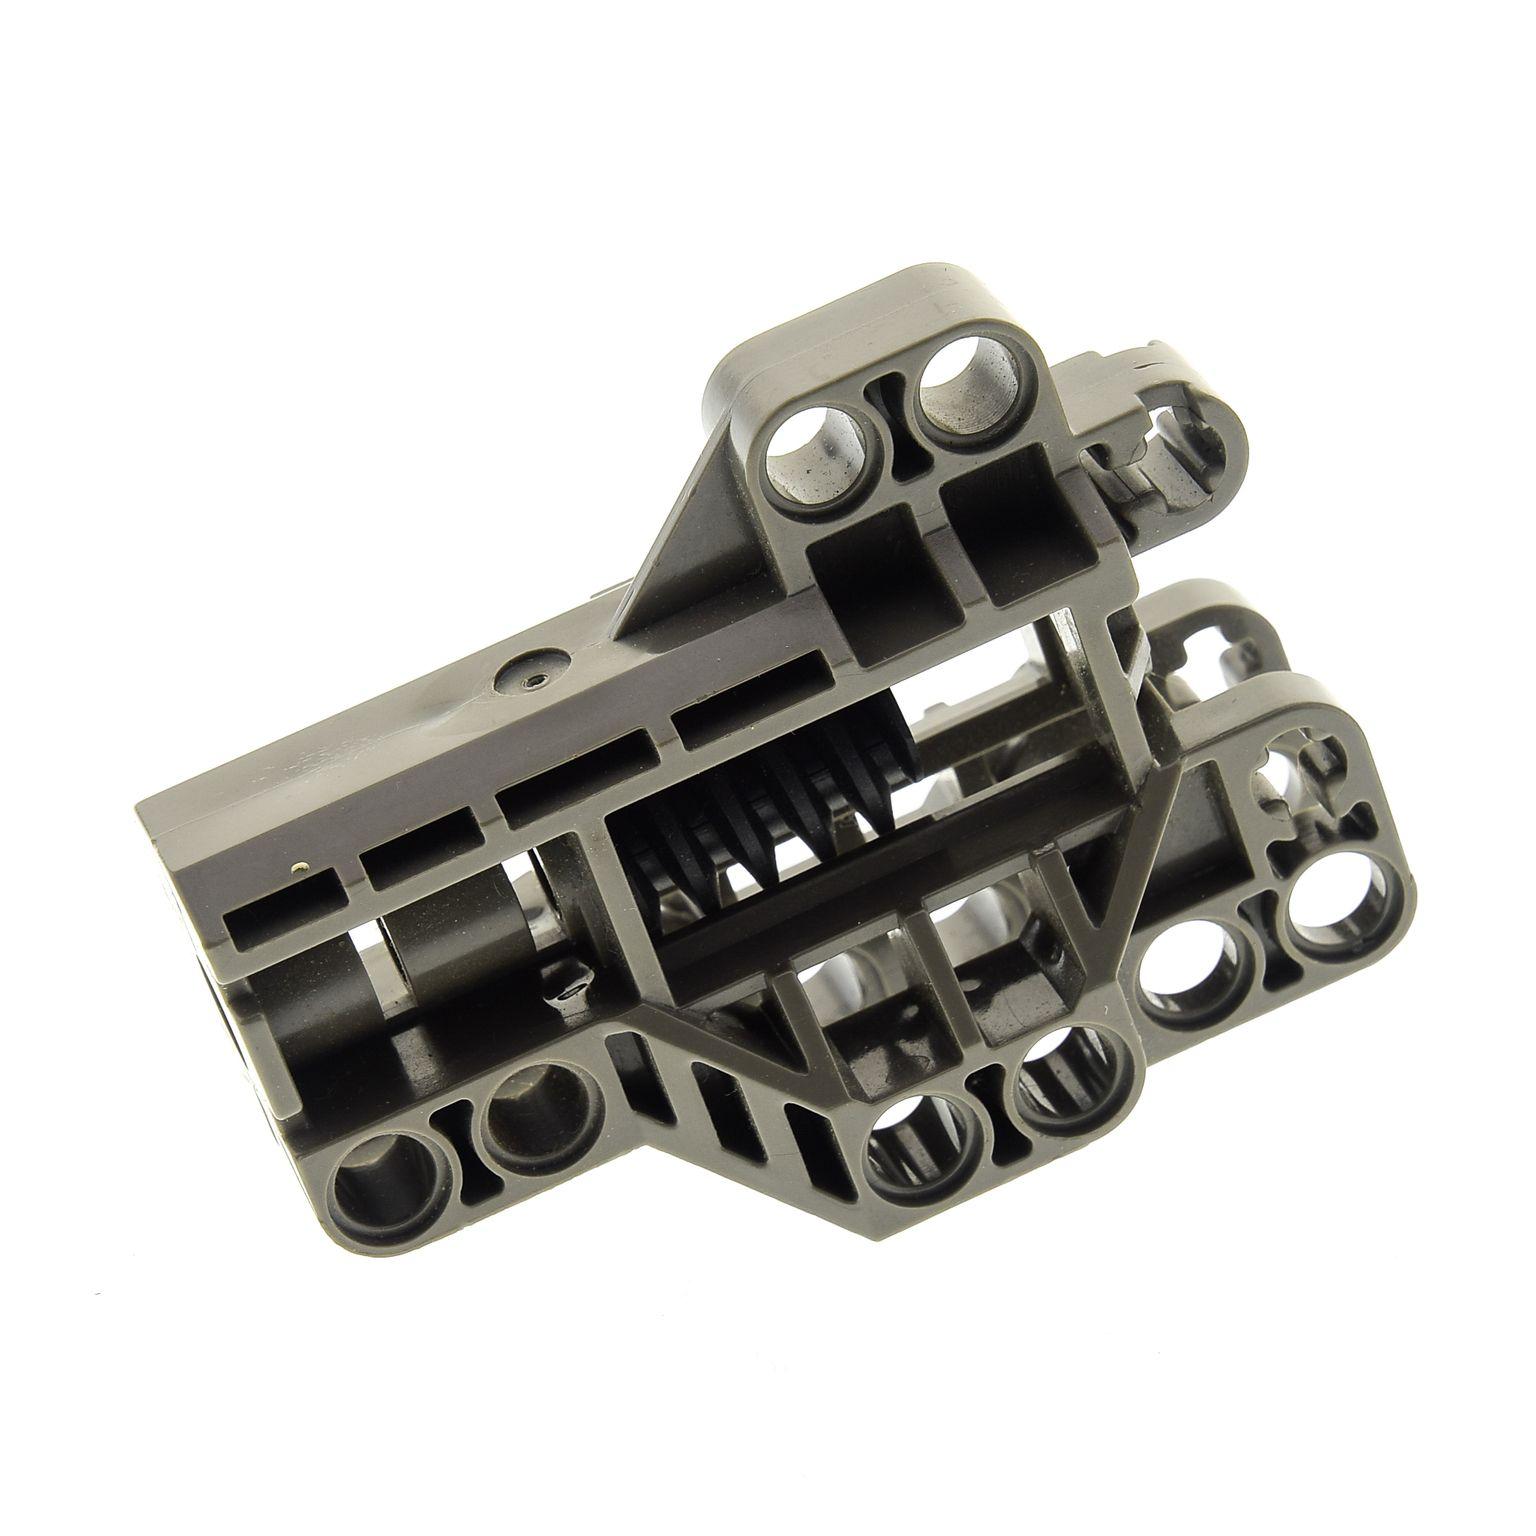 1 x Lego Technic 4716 Black Worm Screw